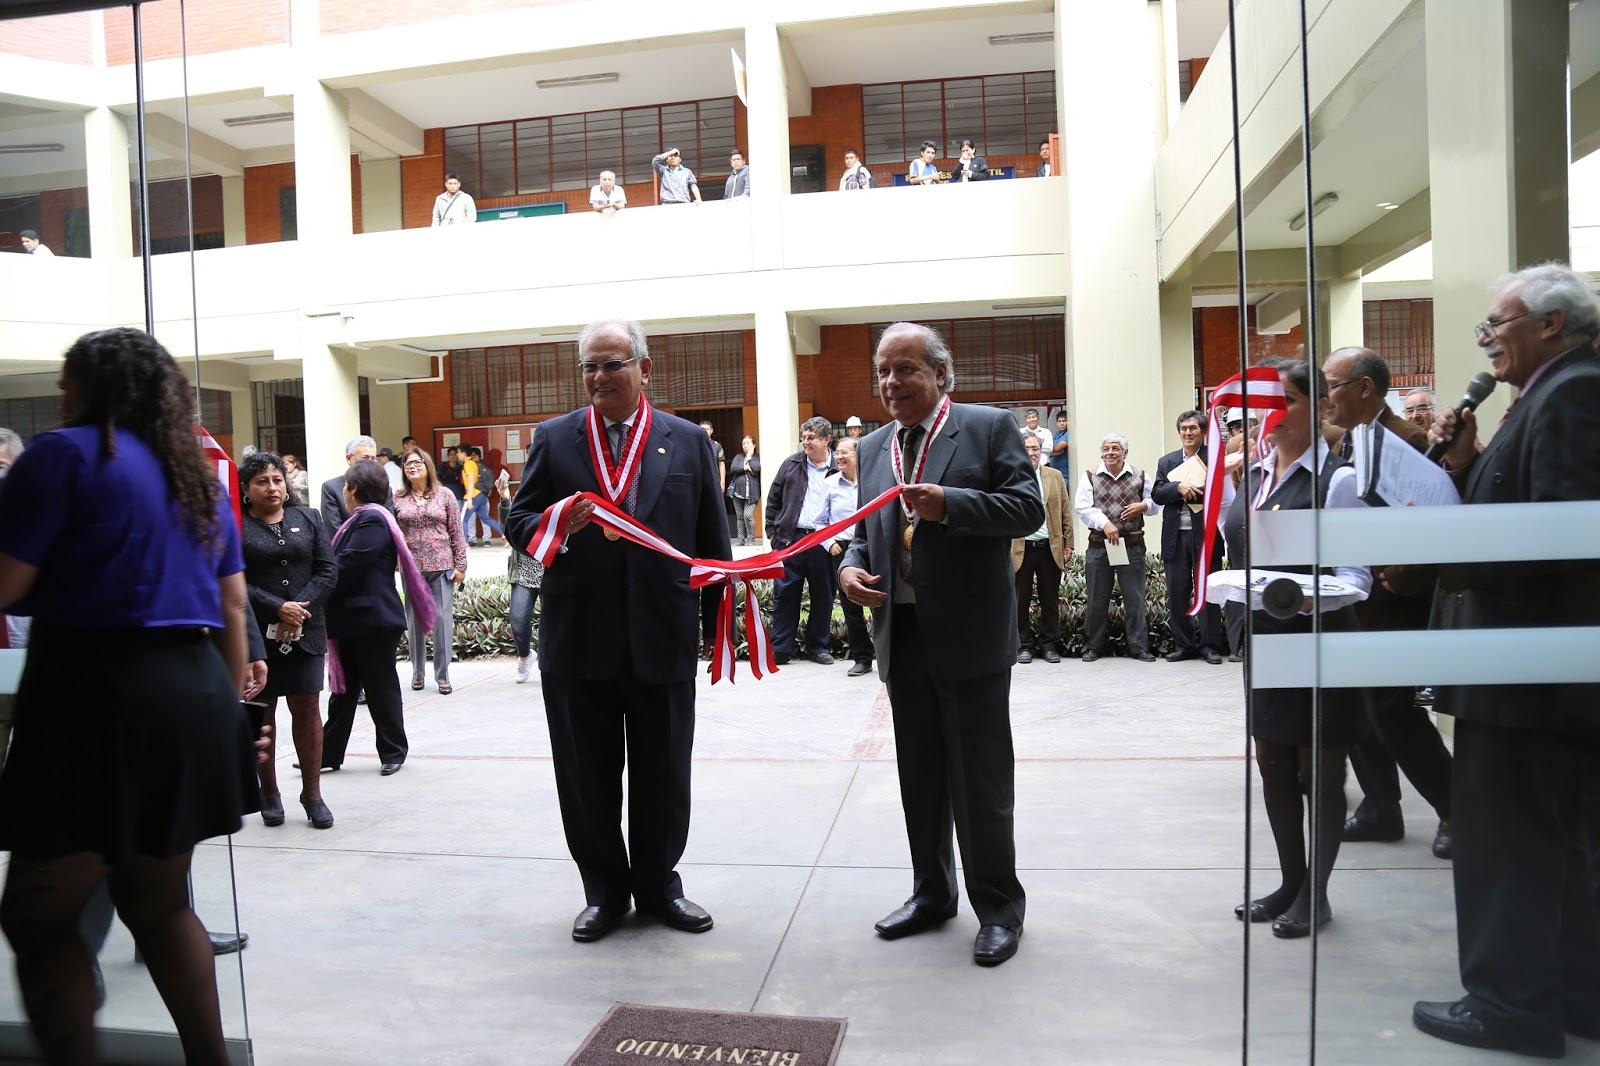 FIEE inaugura Pabellón para facilidades académicas de los docentes